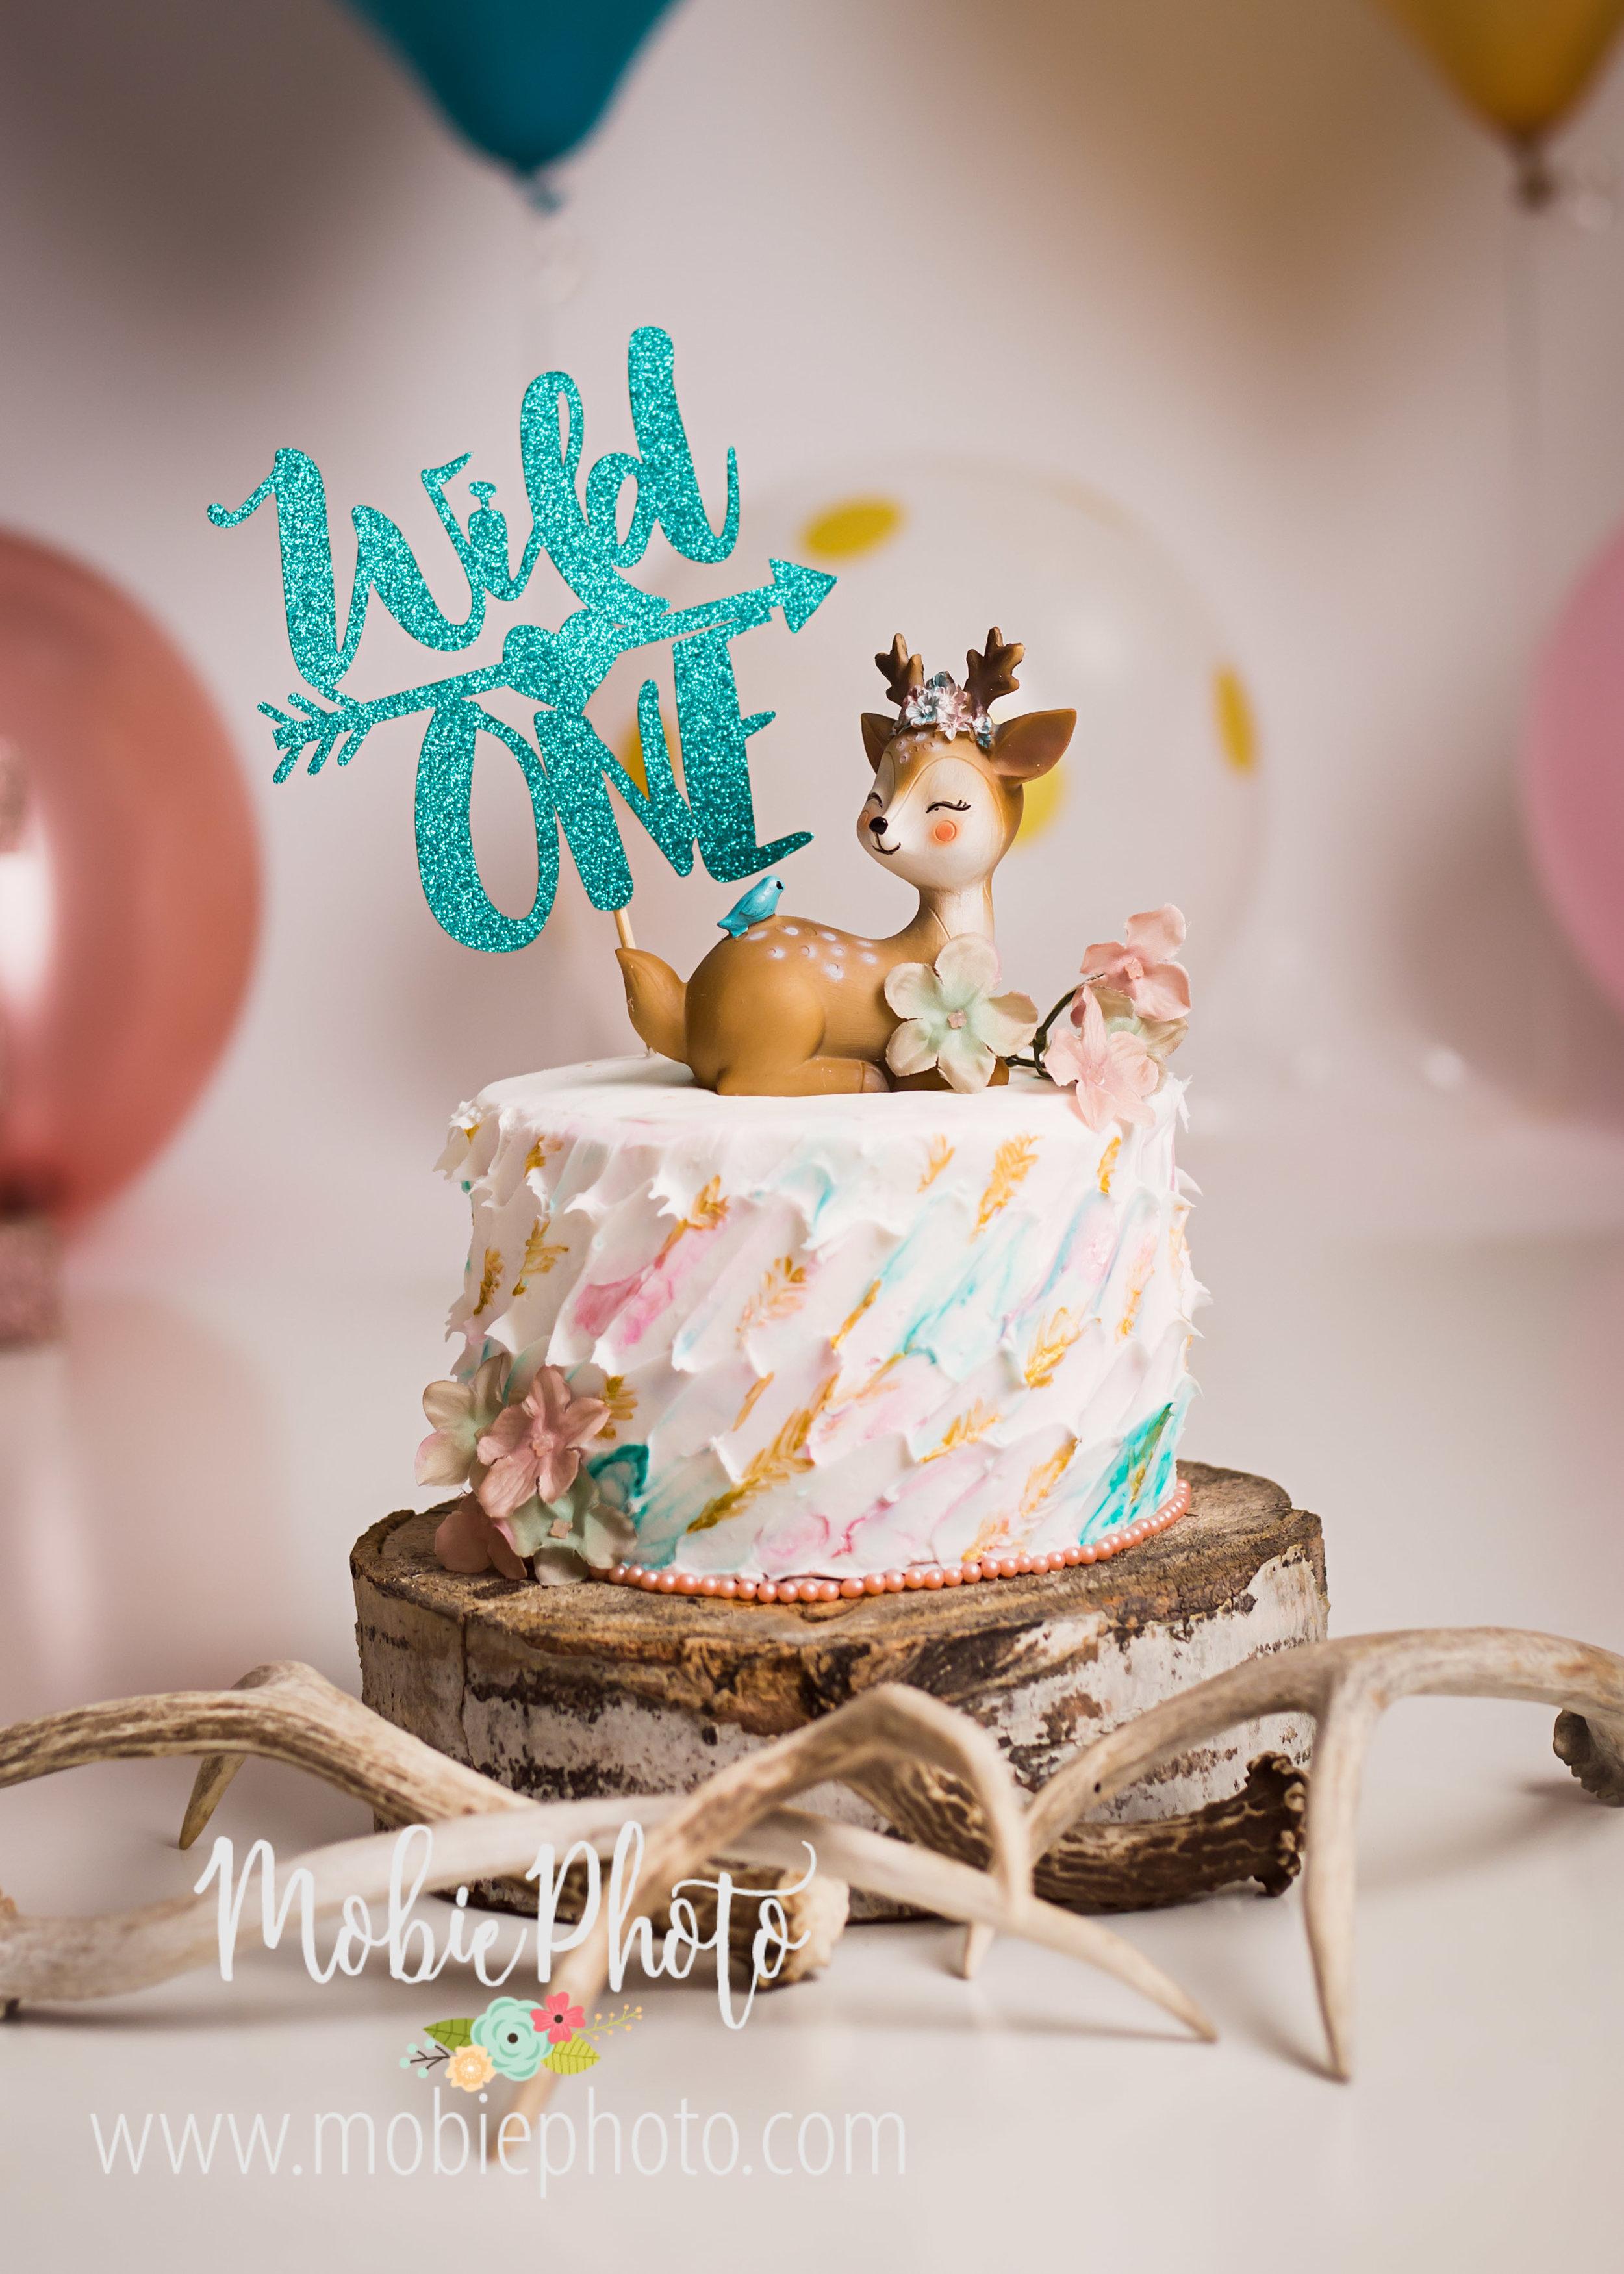 Baby's First Birthday - Cake Smash Photo Session - Mobie Photo Utah Newborn Photography